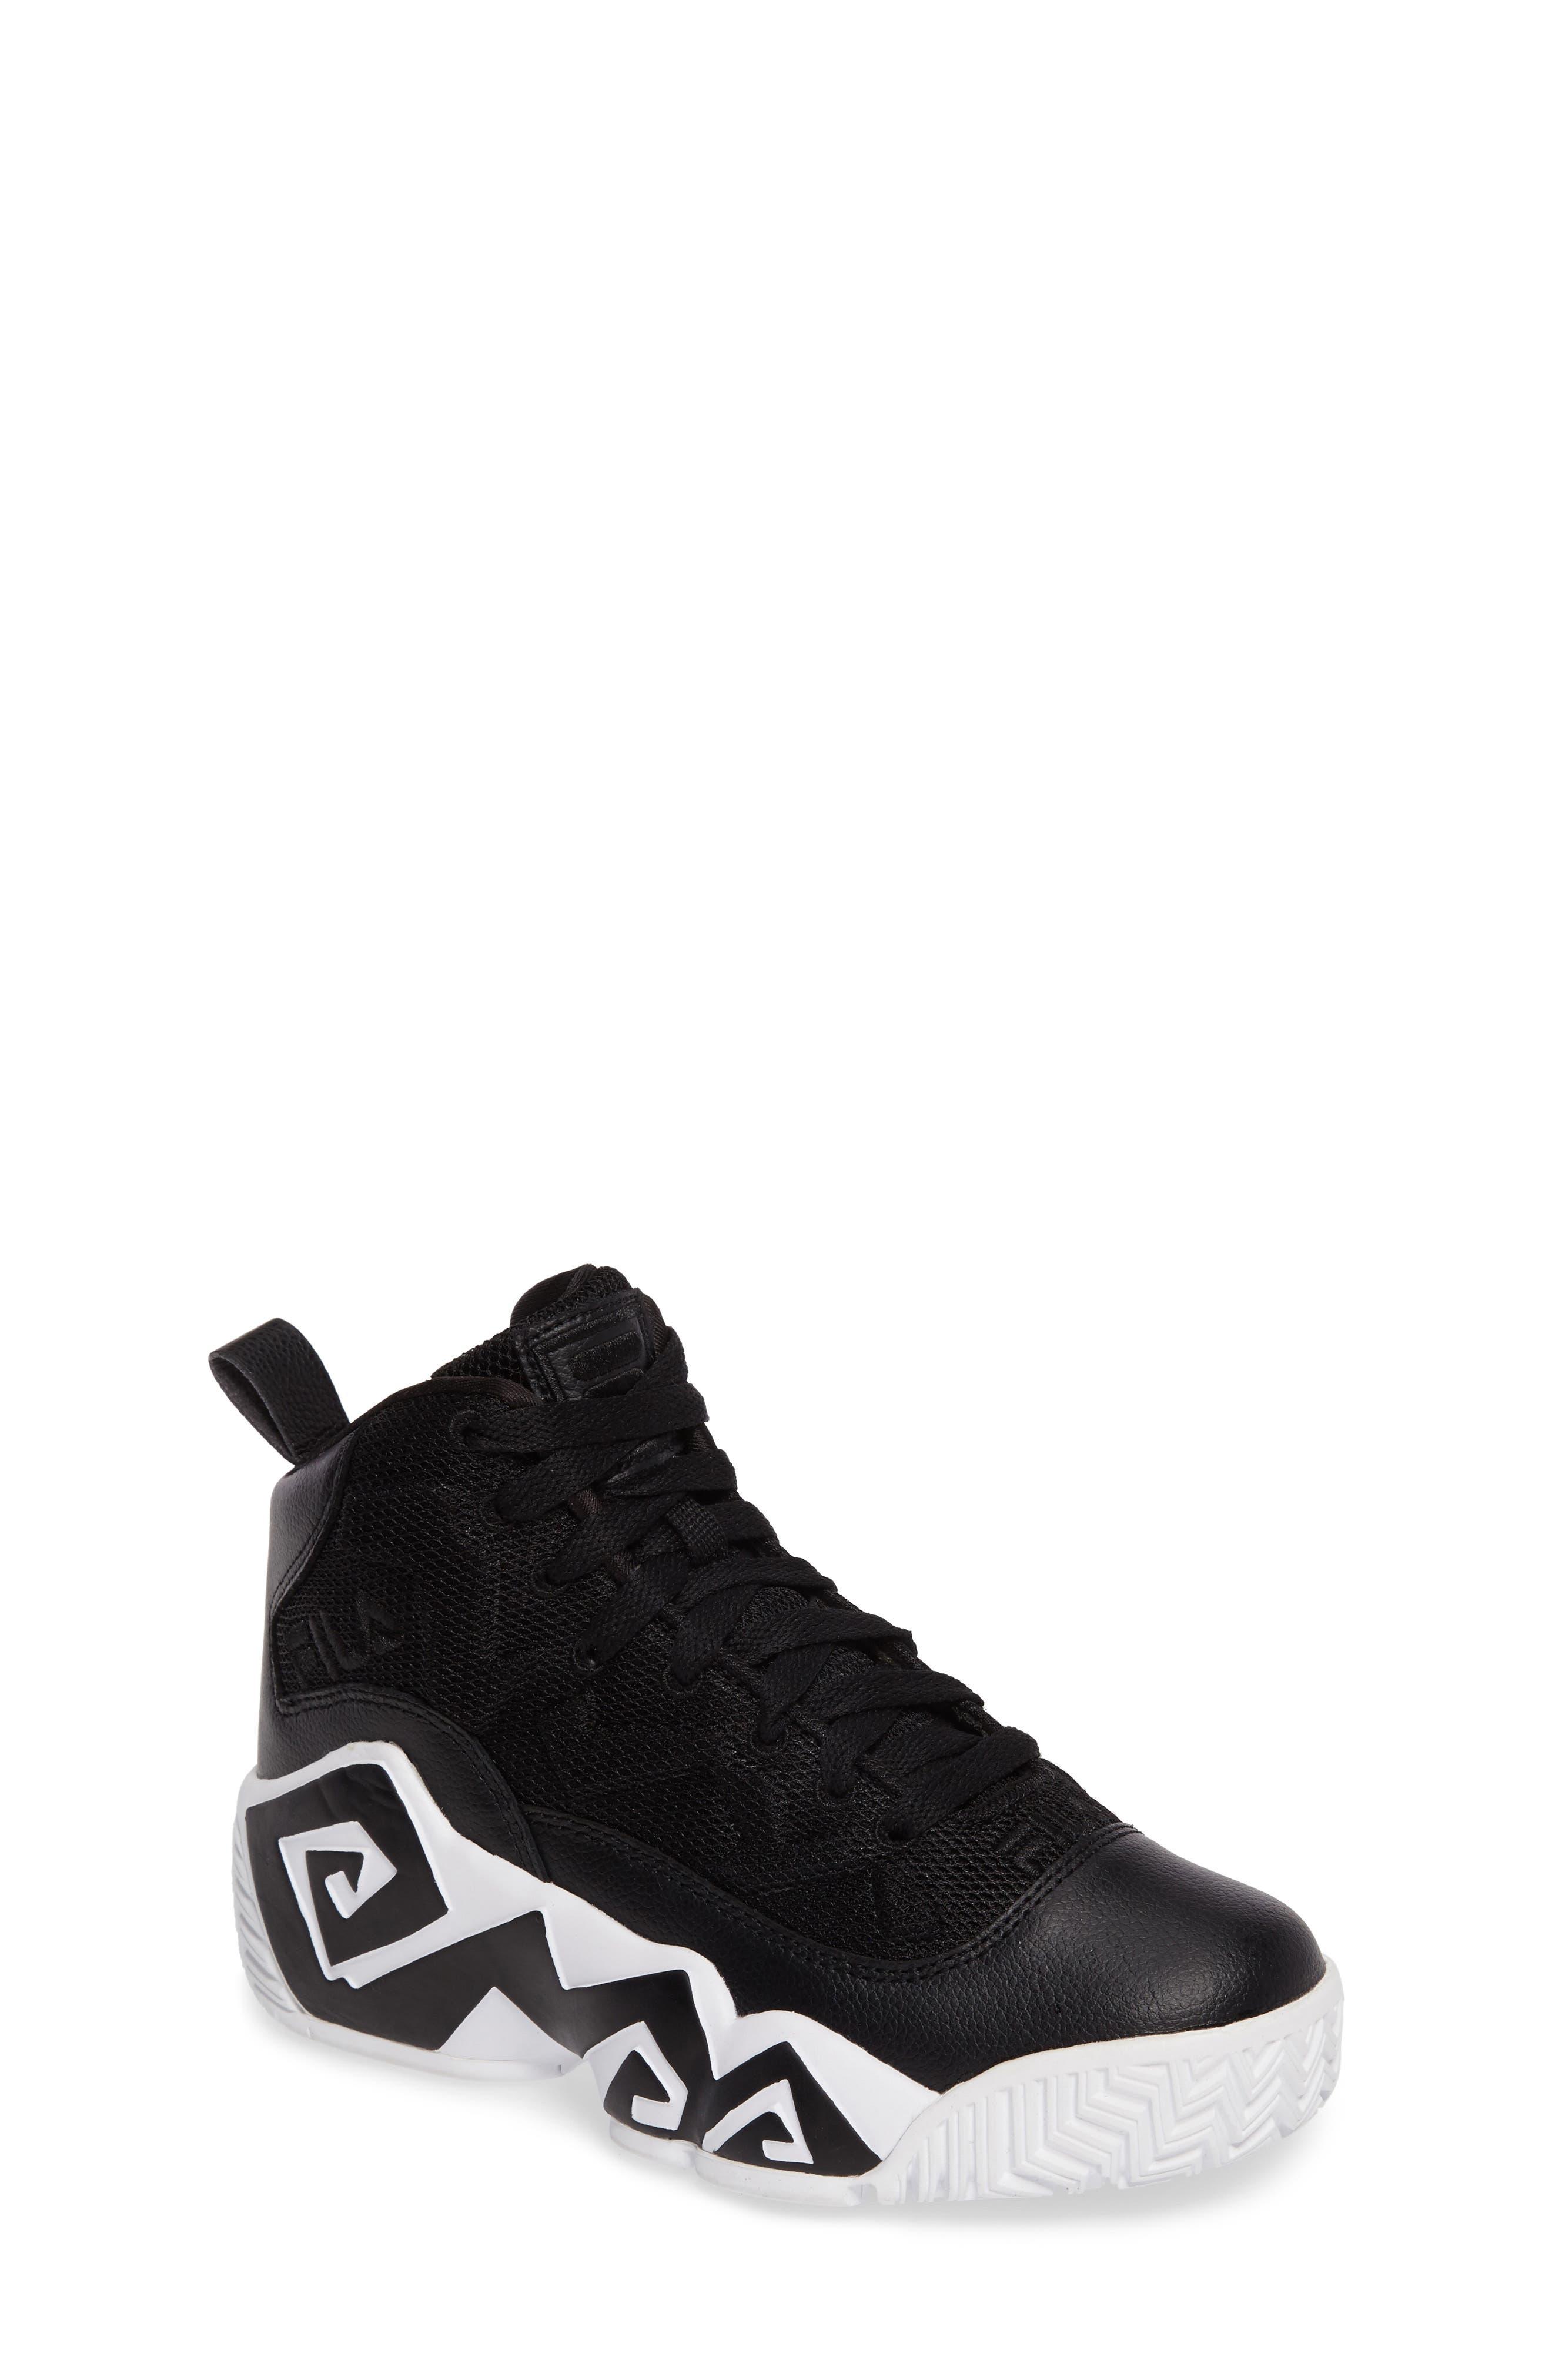 MB Mesh Sneaker,                             Main thumbnail 1, color,                             016